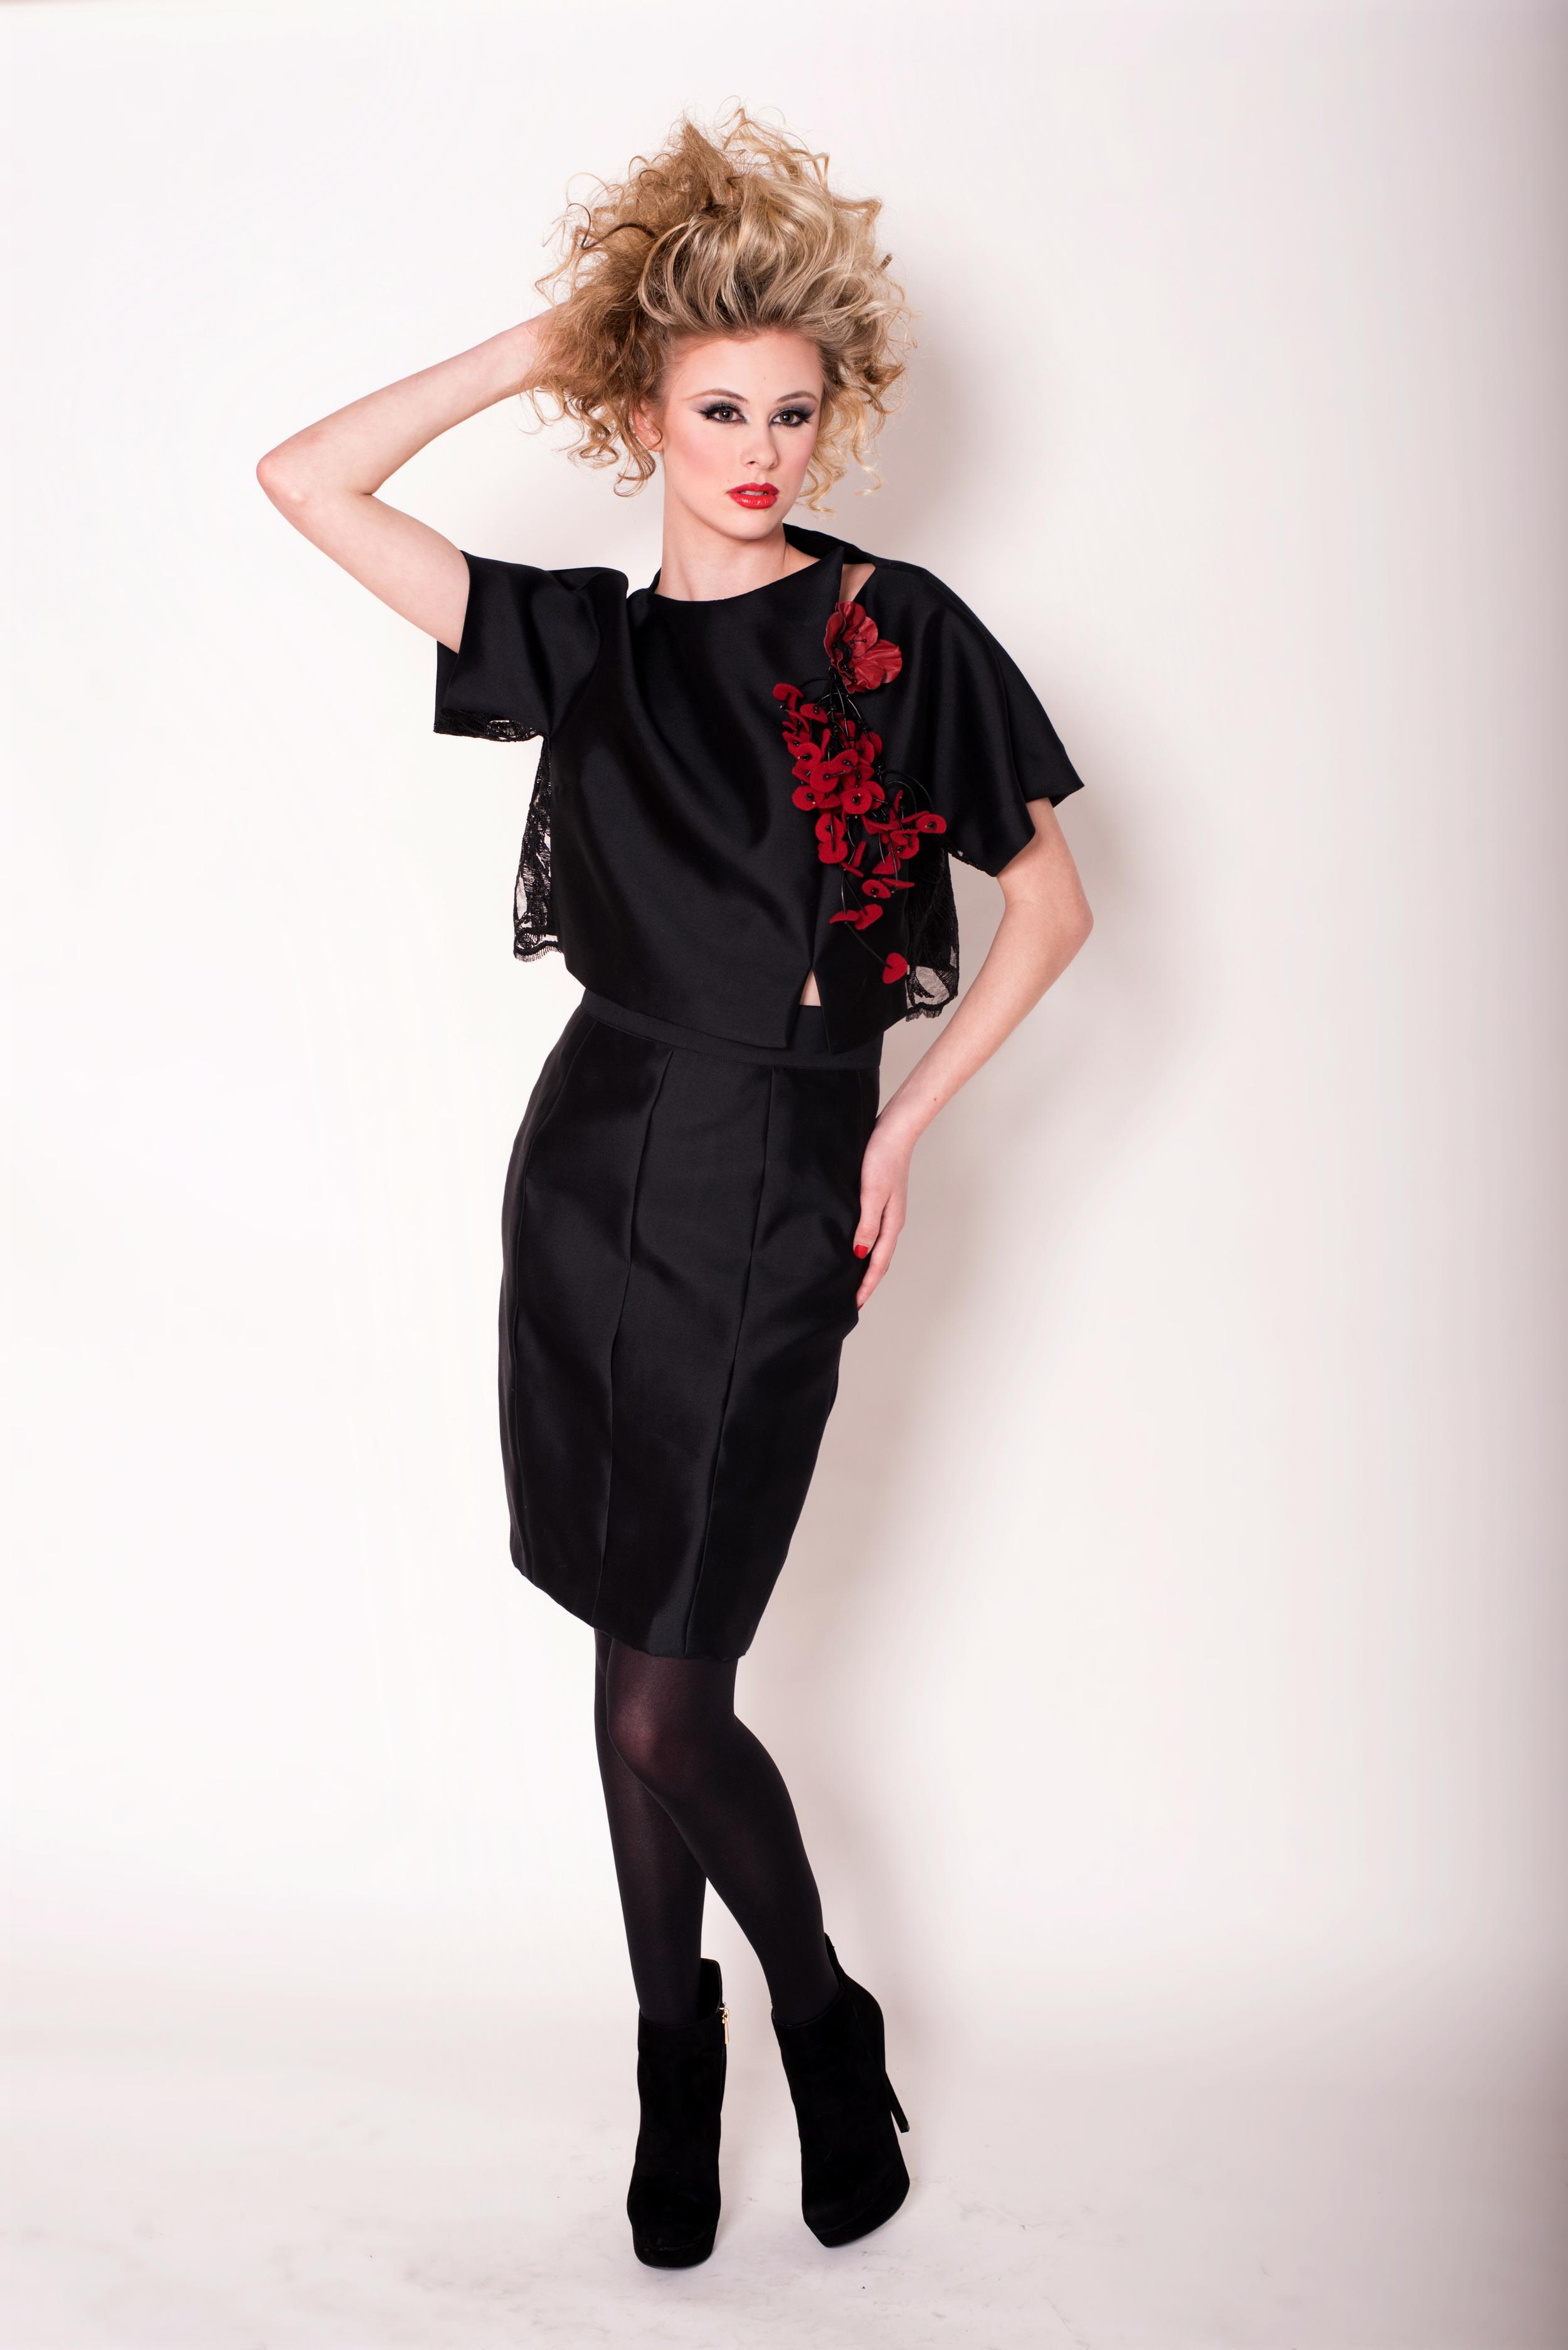 nine-gleyzer-designer-dress-2.jpg